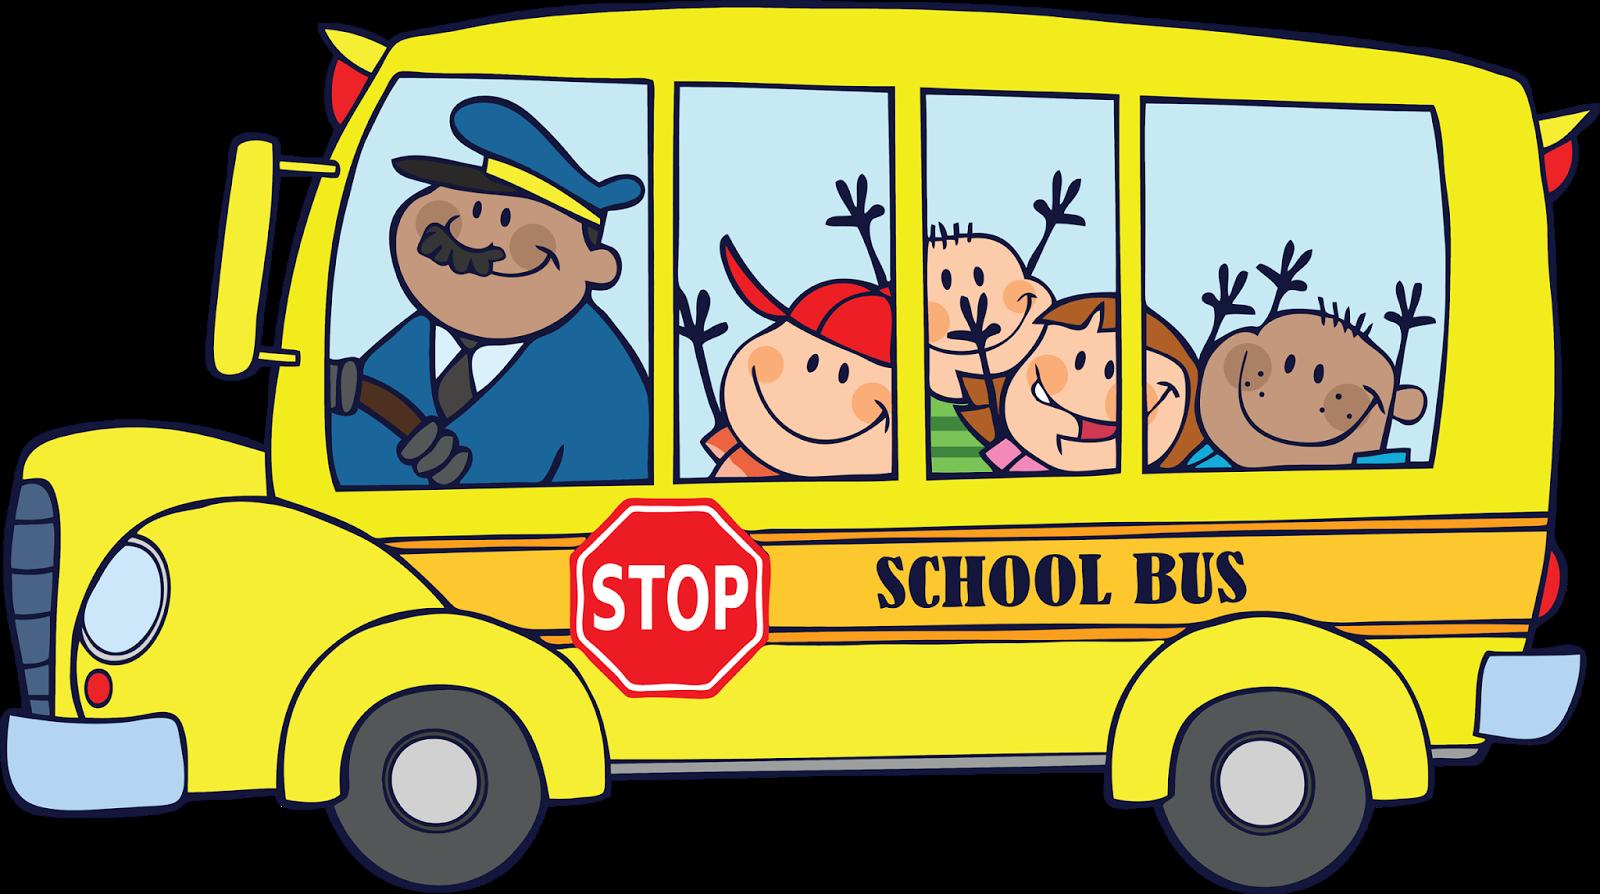 Preschool clipart dismissal. Lee public schools bus